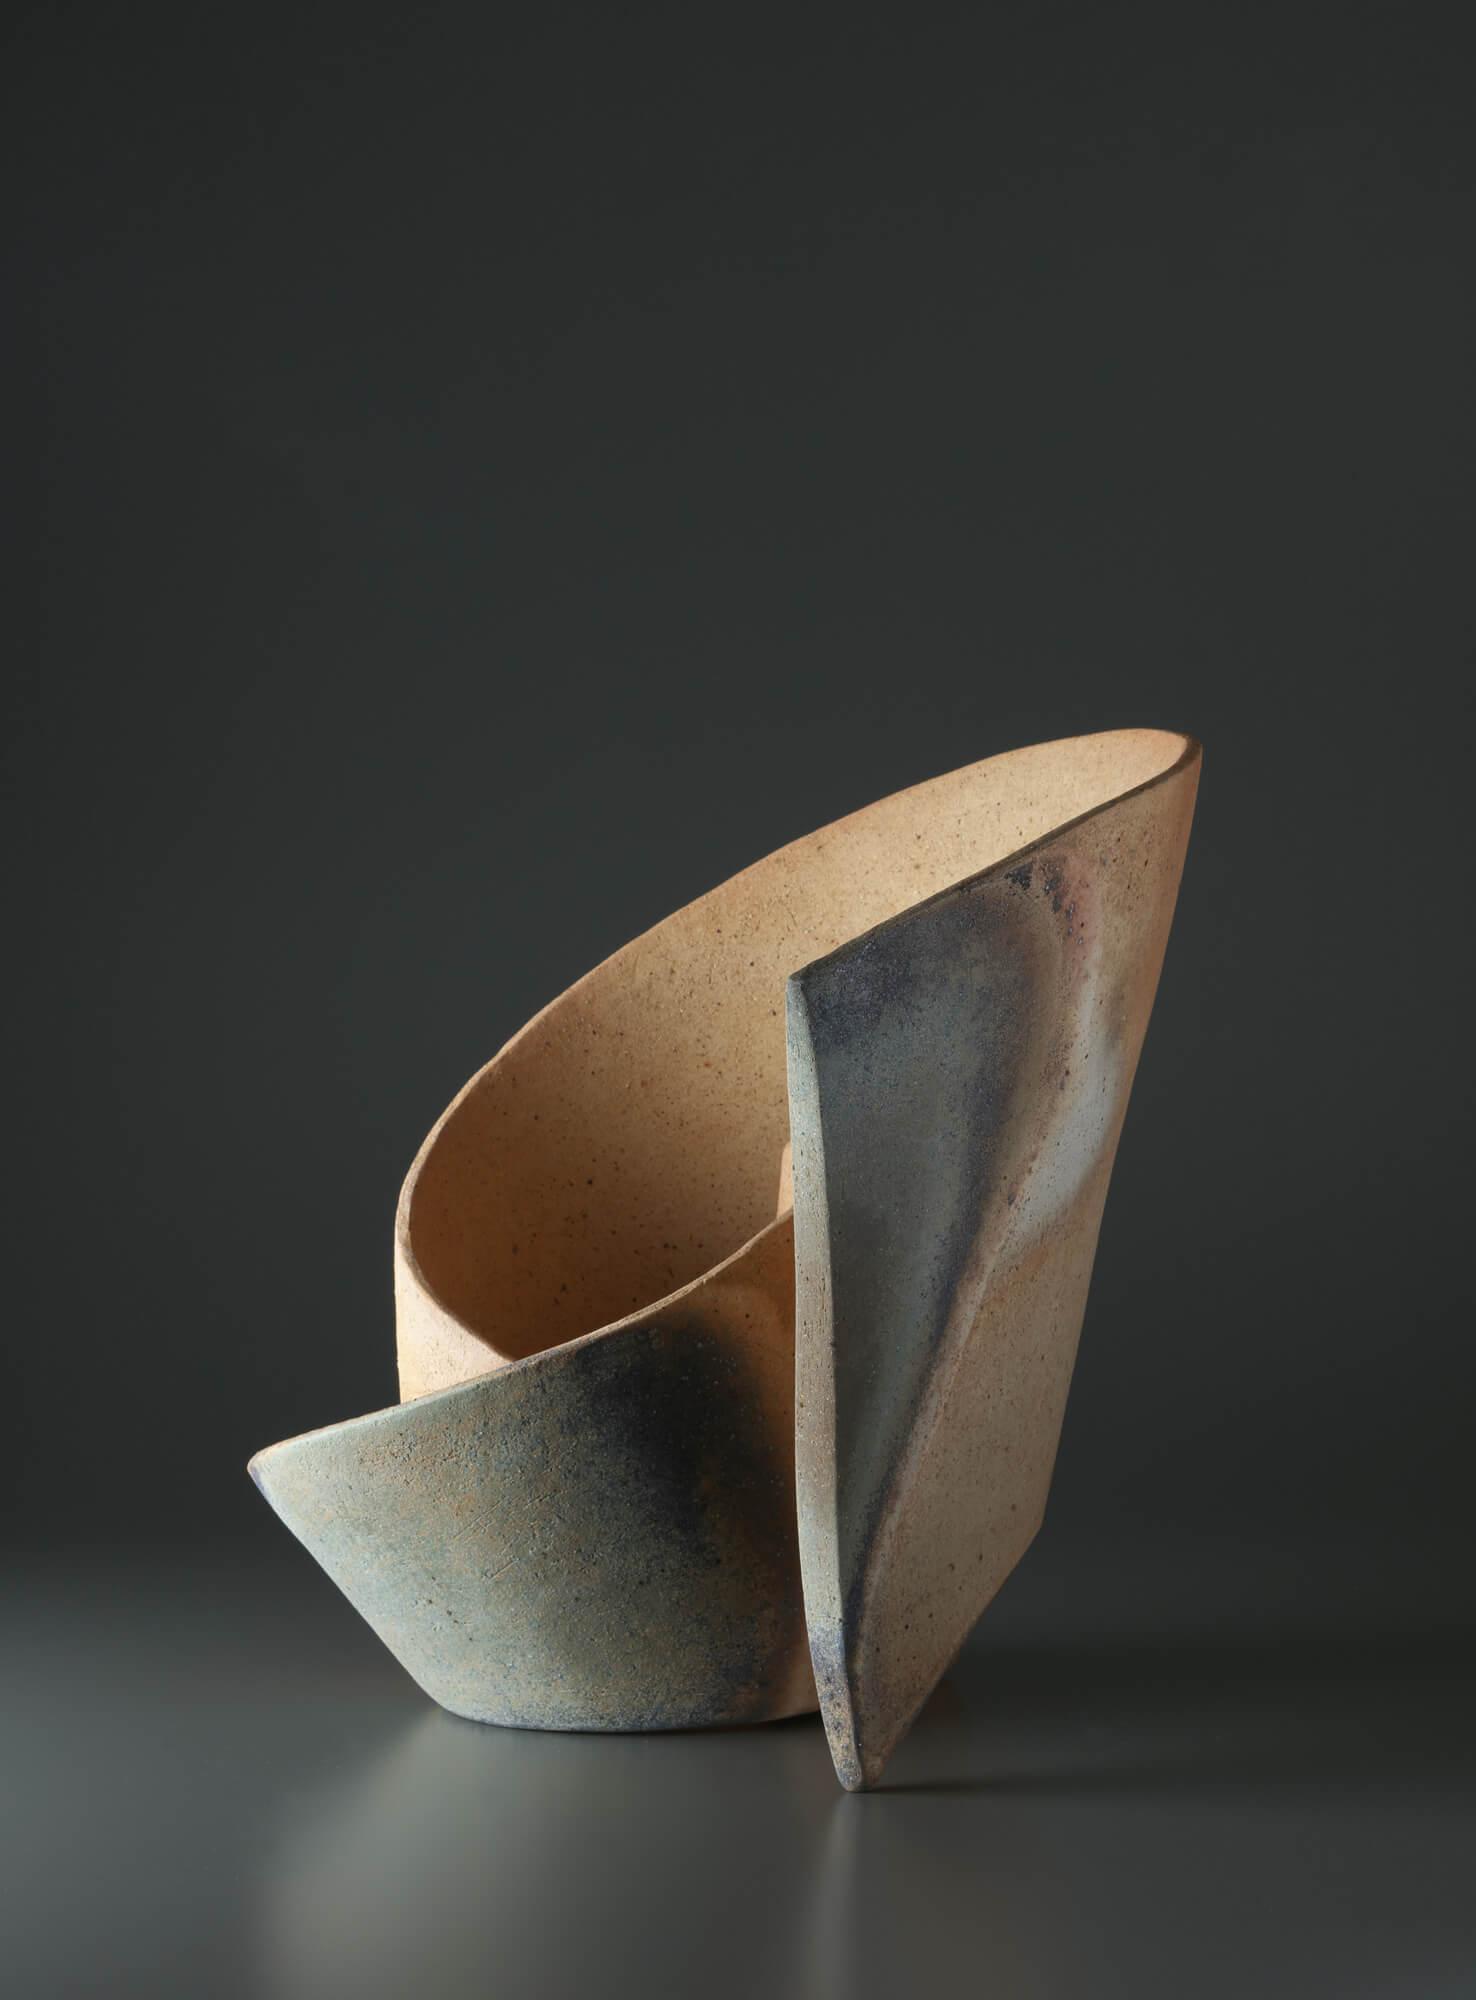 Kei (Mindscape)(2016)